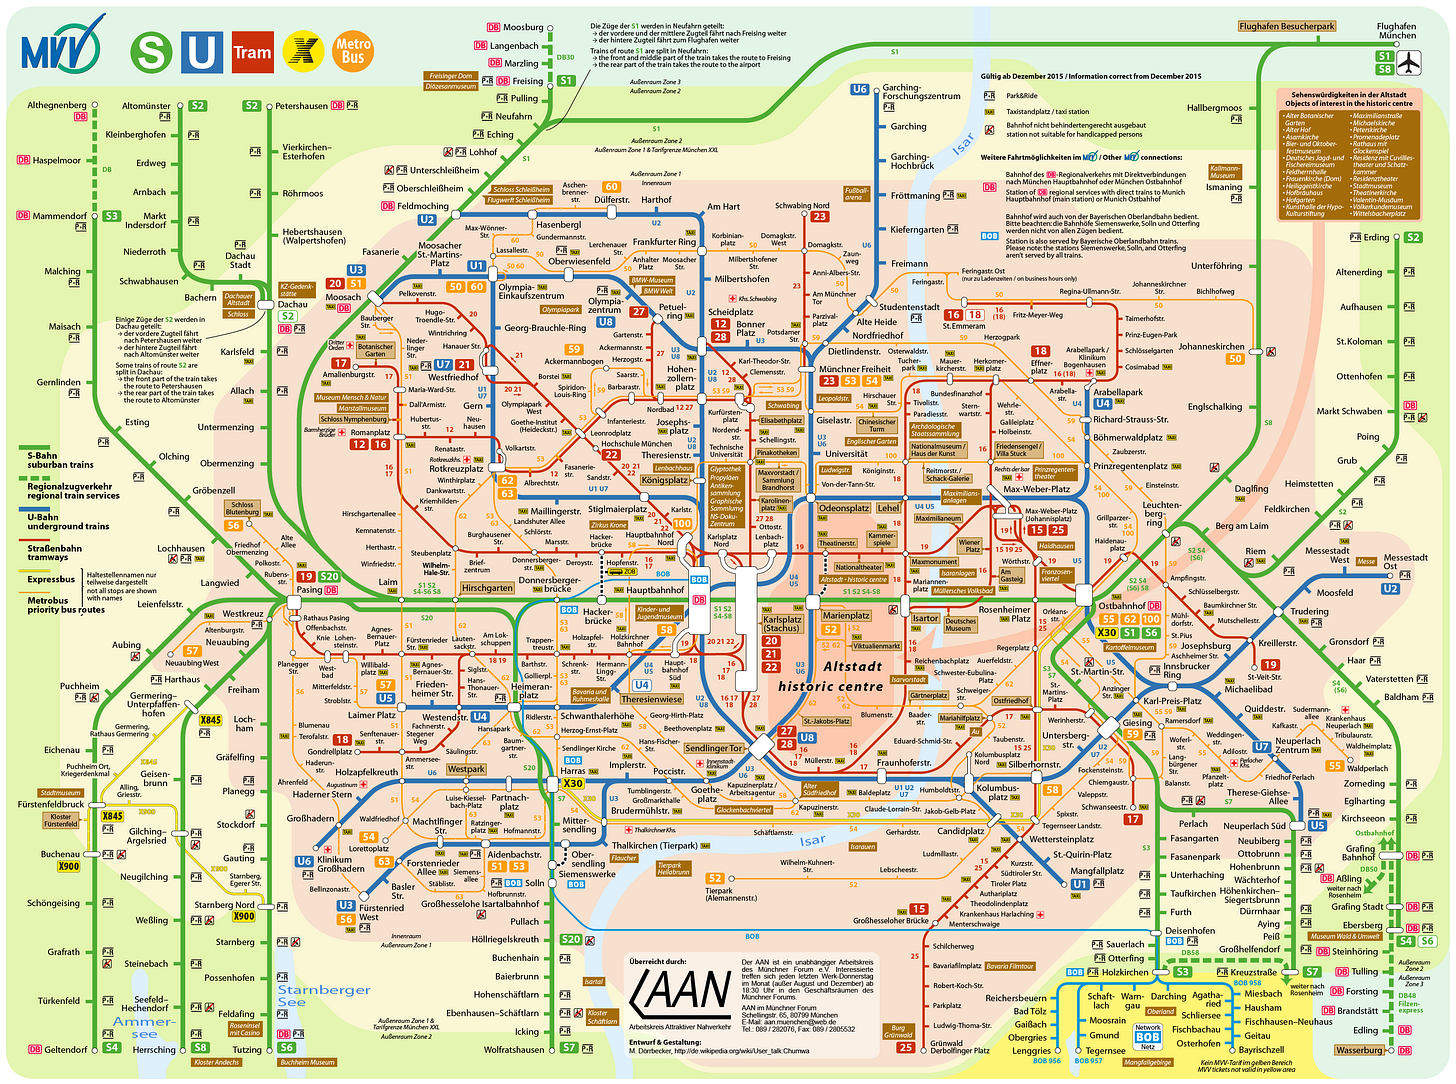 map of Munich's public transportation system